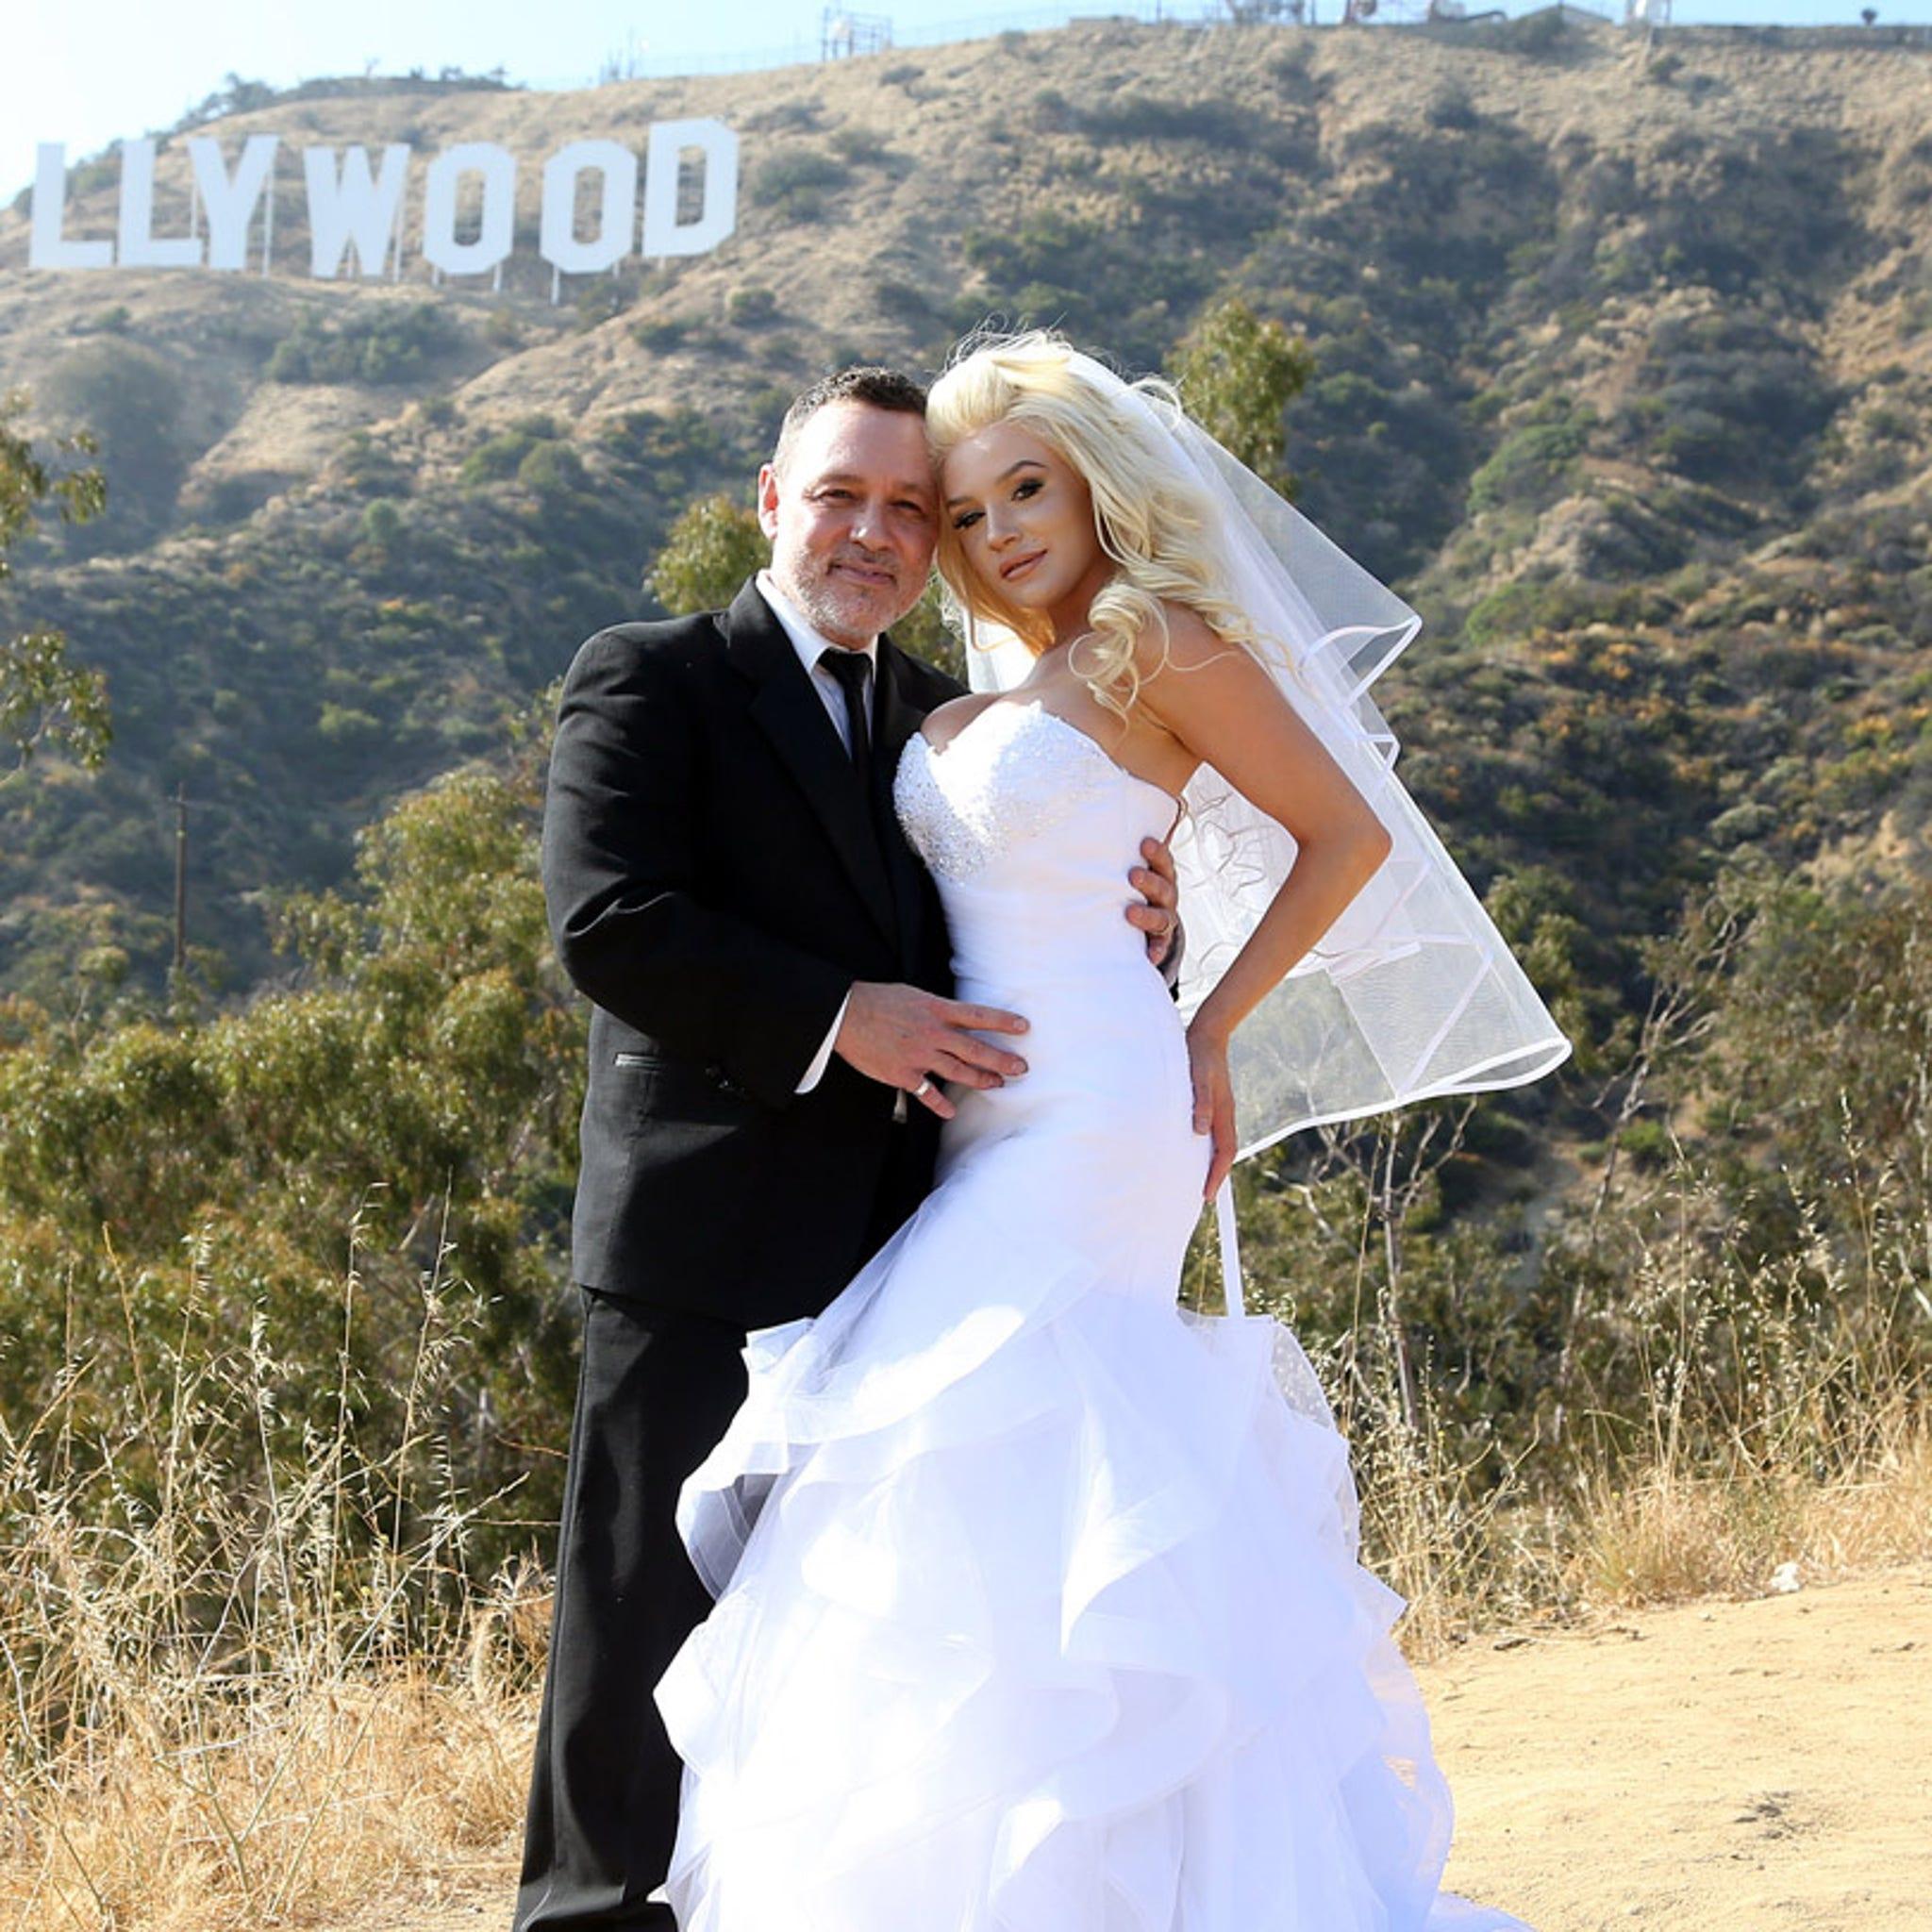 Pregnant Courtney Stodden & Doug Hutchison Renew Vows for 9th